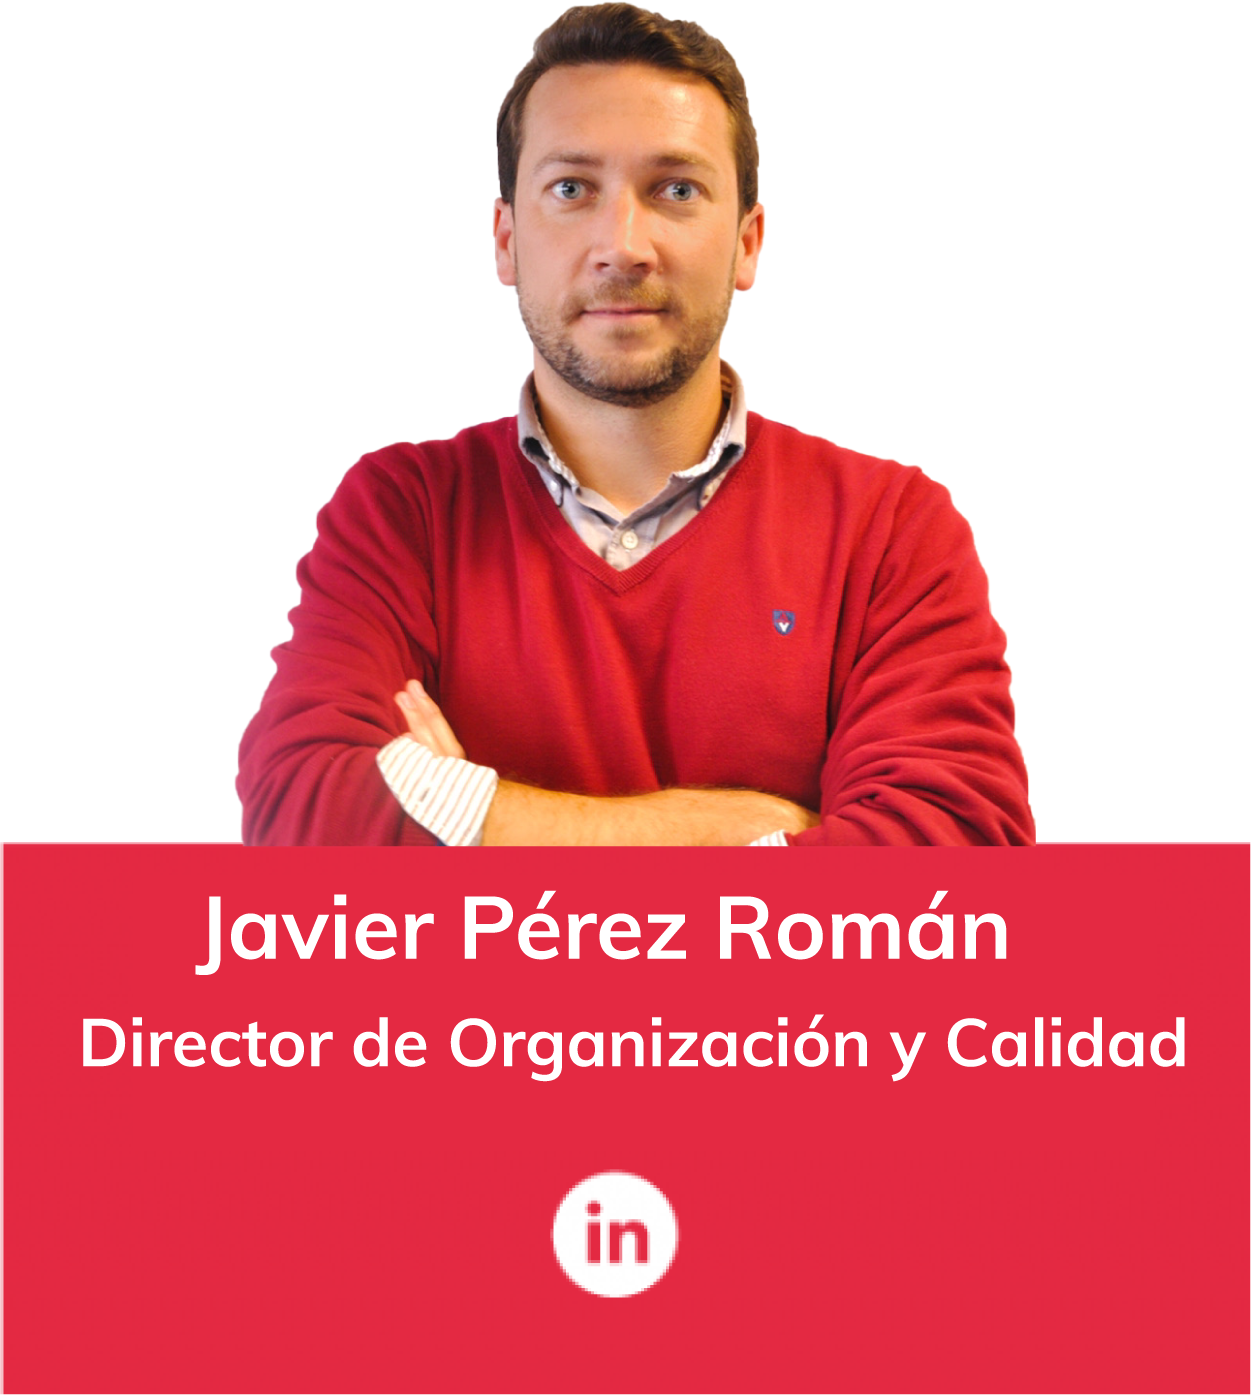 Javier Román Pérez